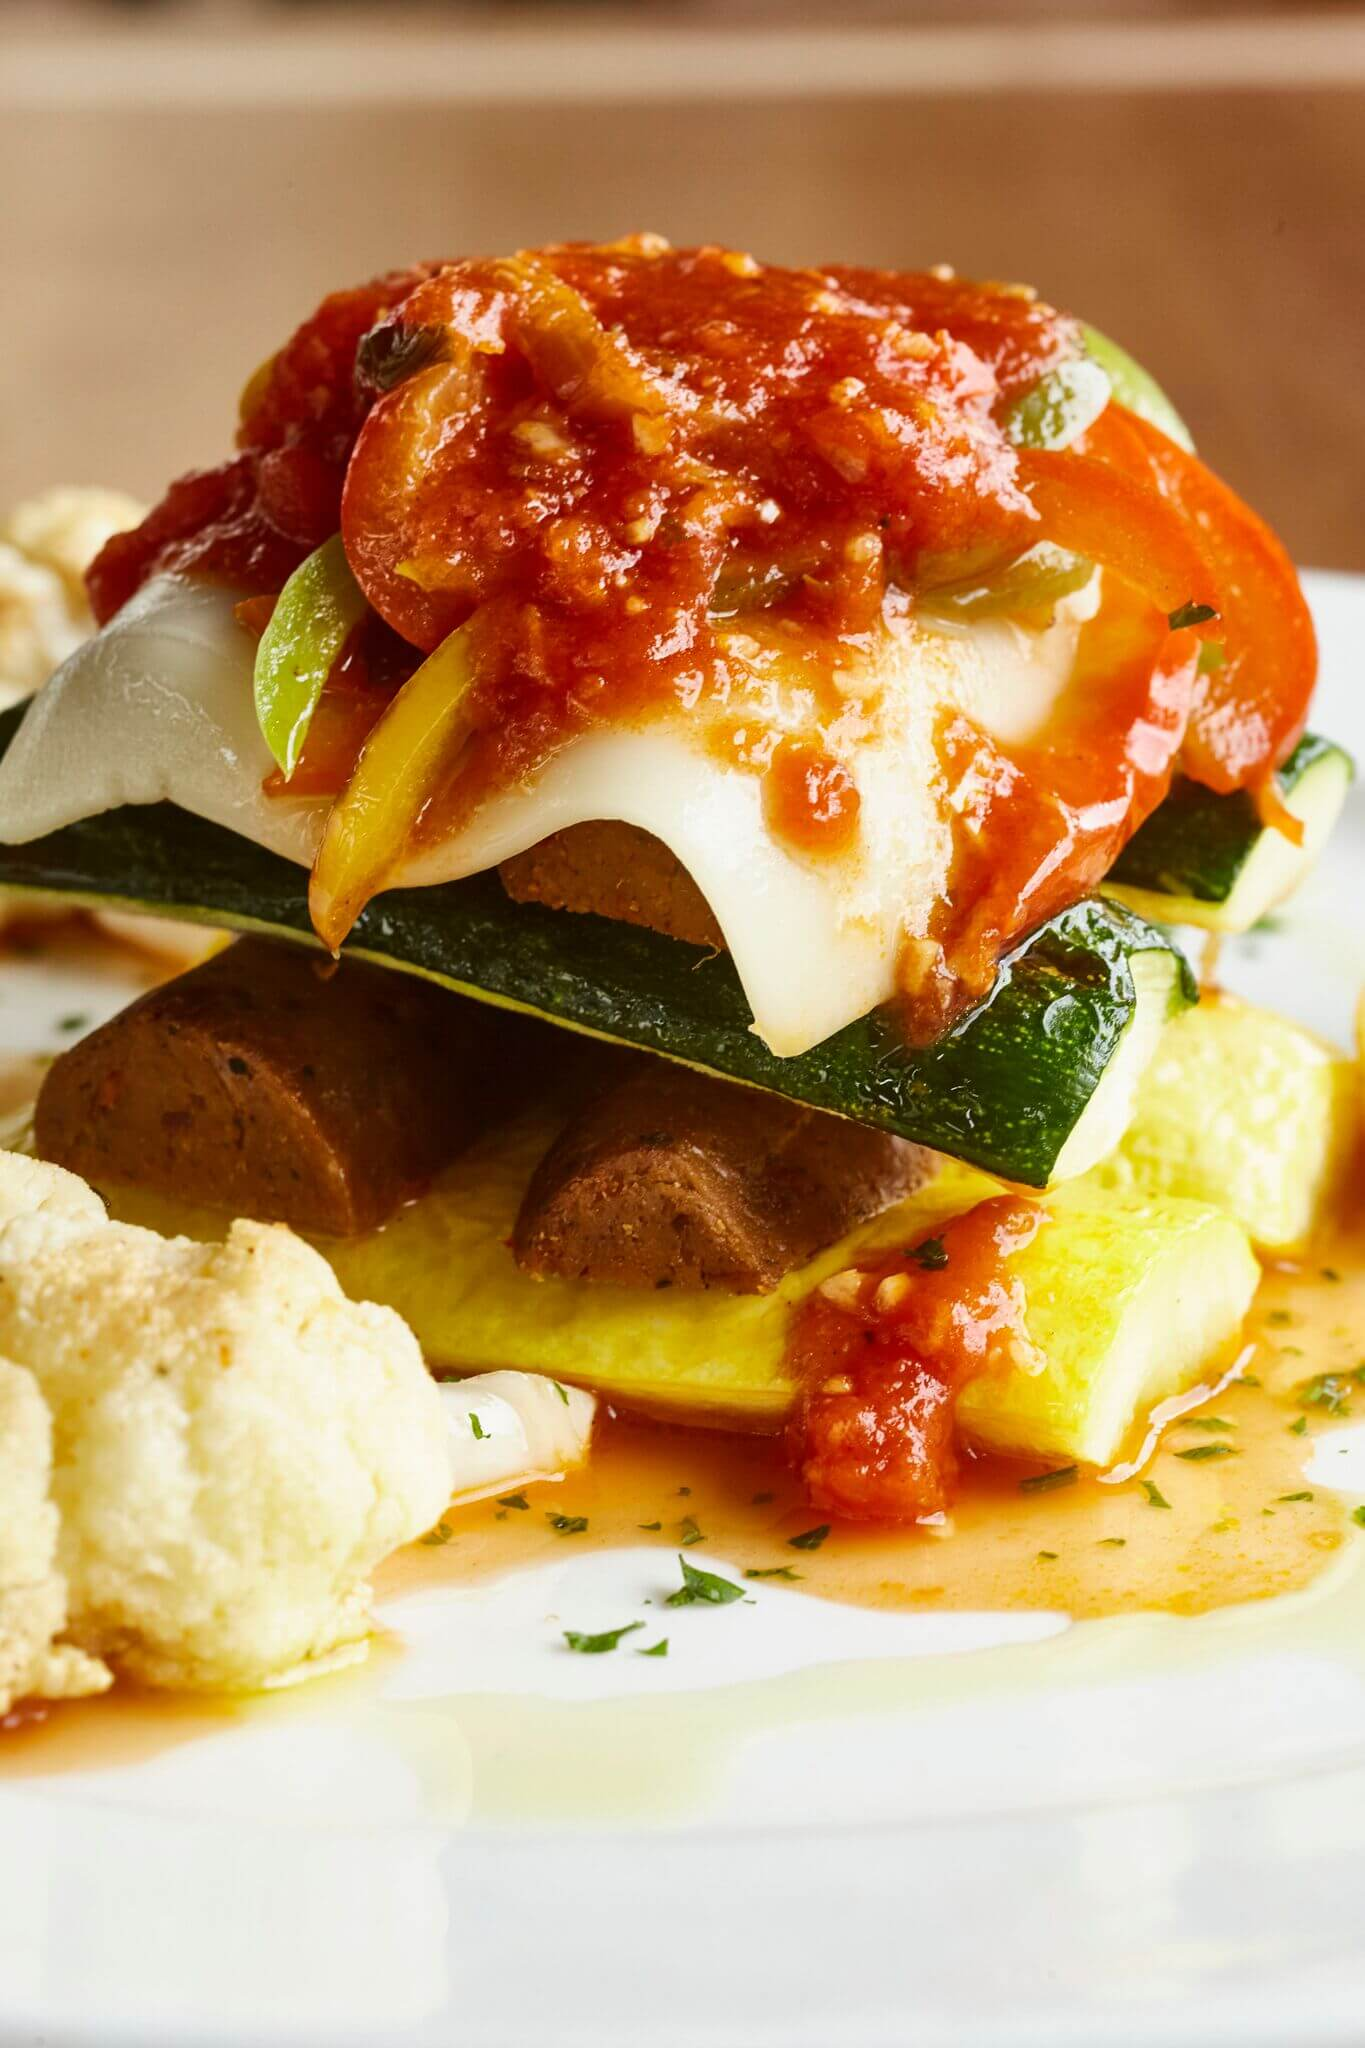 Dallas Steakhouse Al Biernat's Launches Vegan Menu Featuring Tofurky Sausage Lasagne